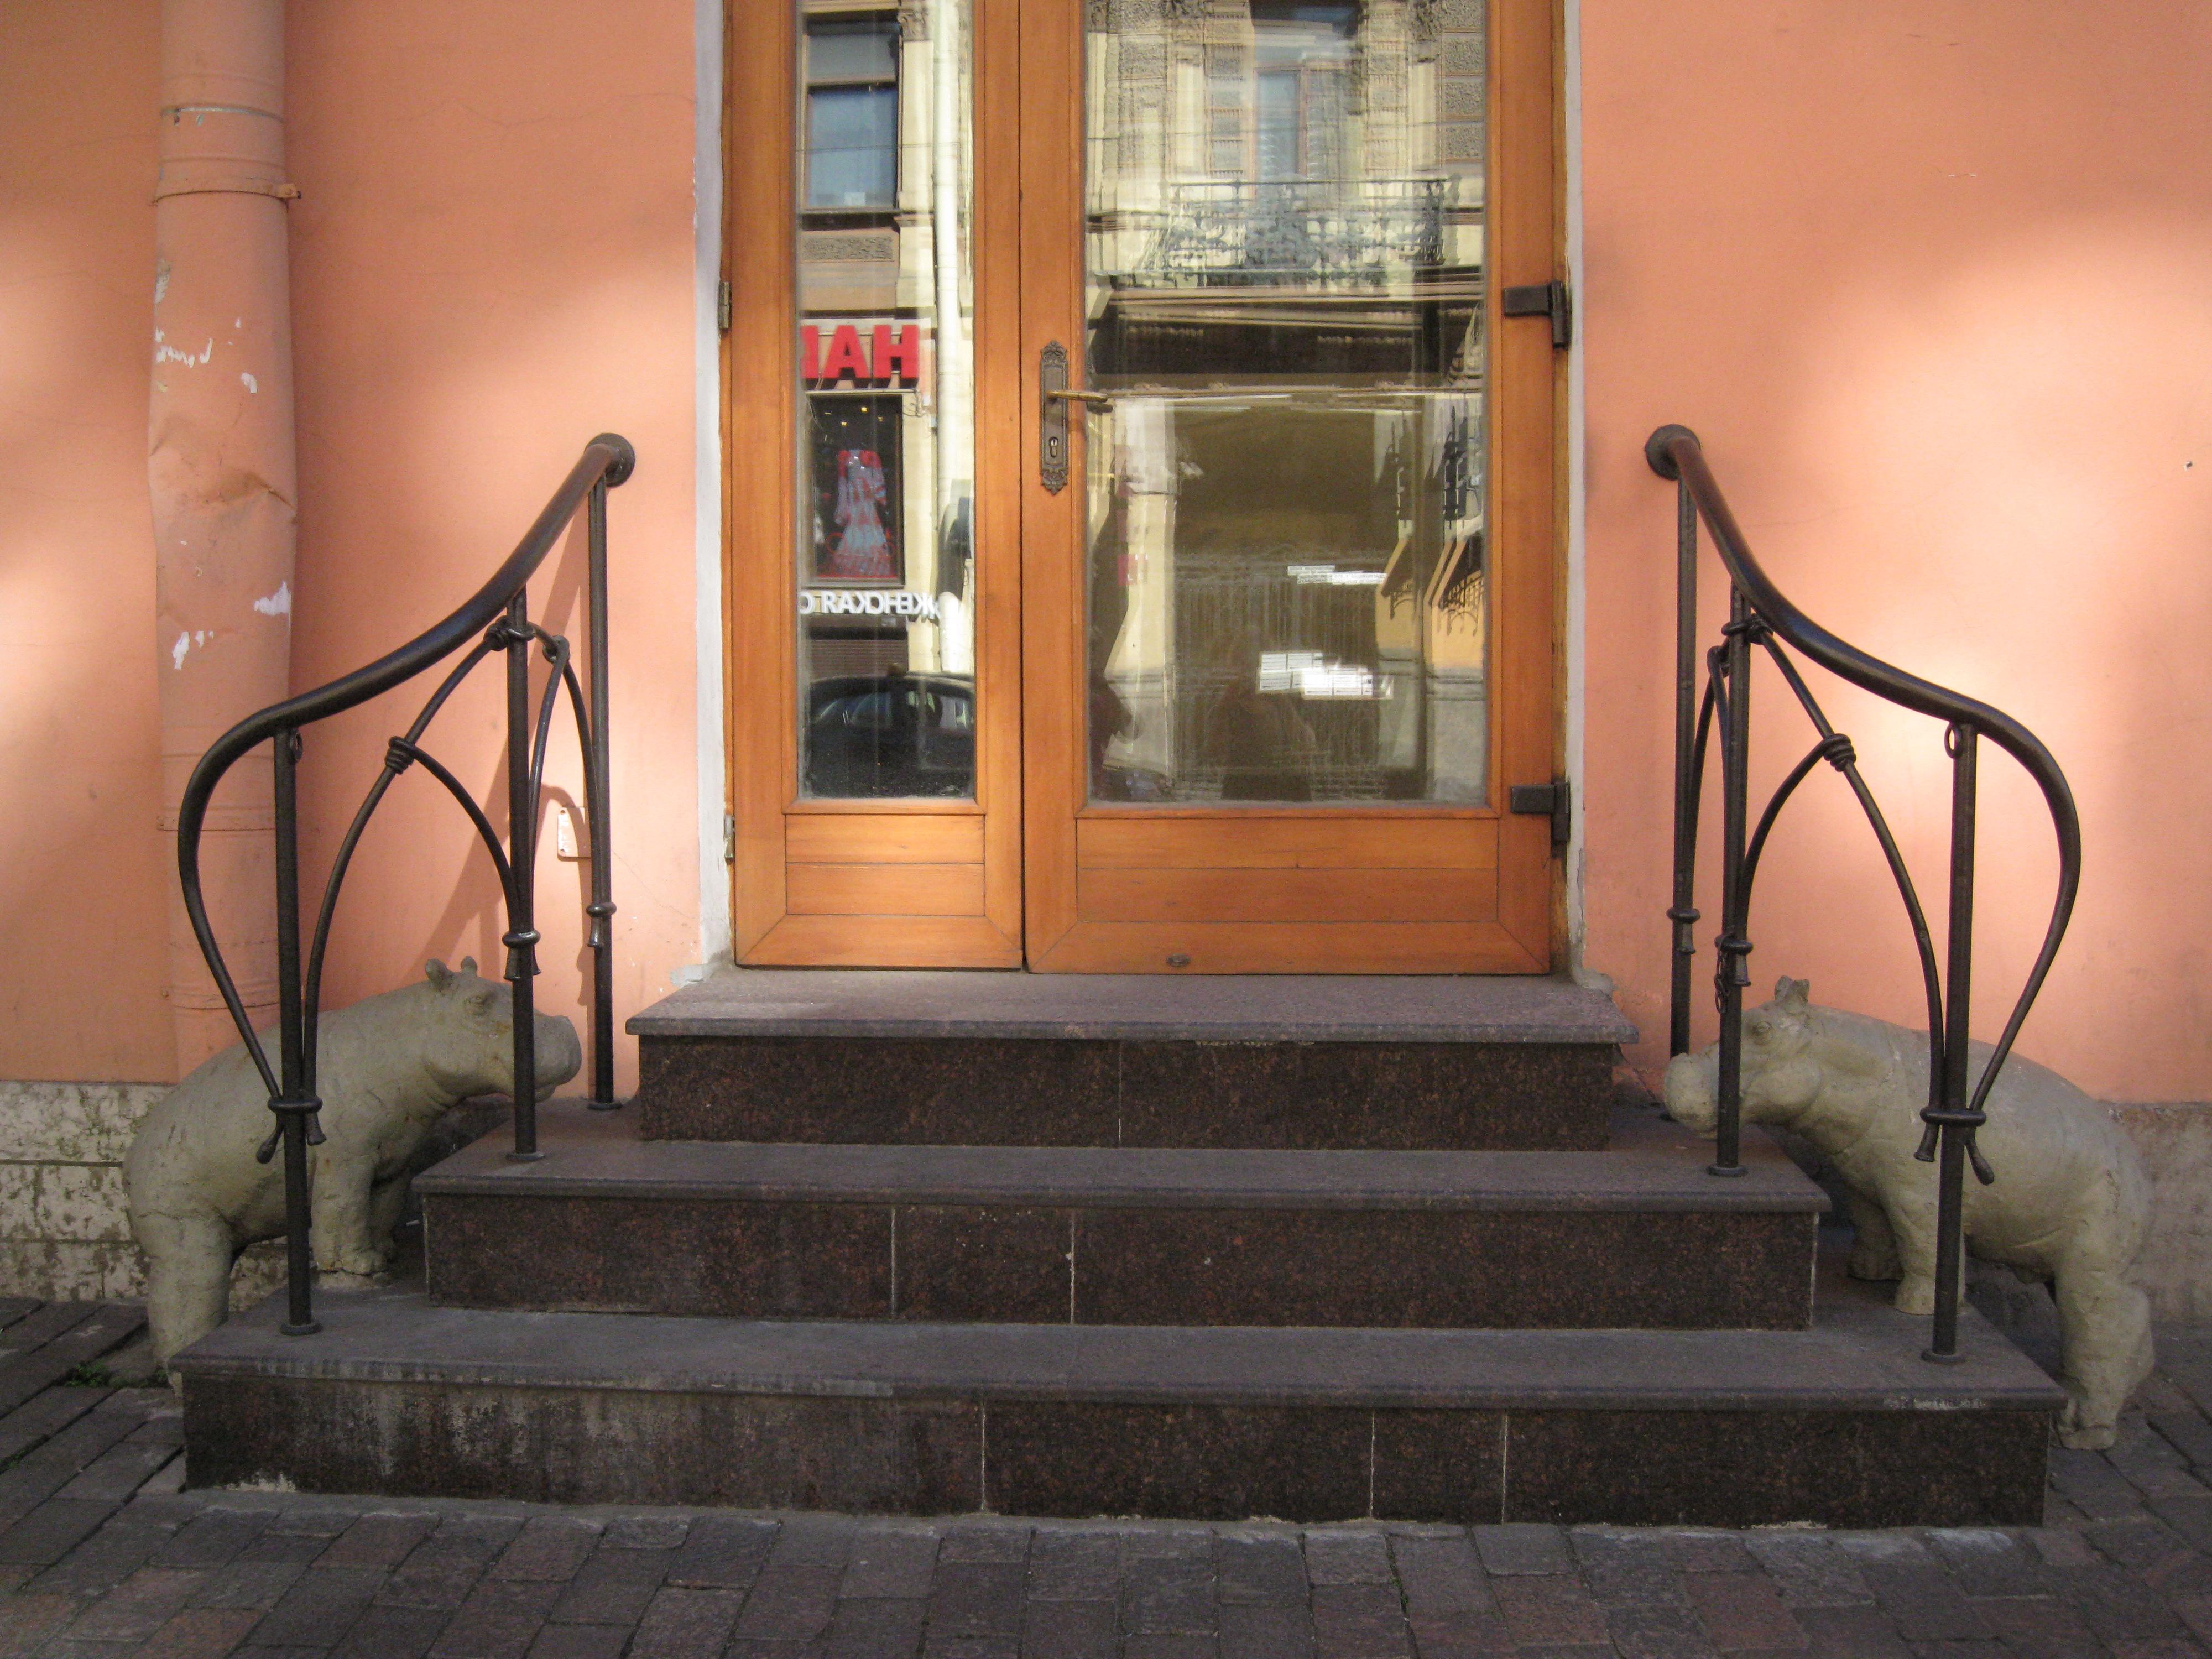 Wallpaper : street, door, city, light, summer, two, detail